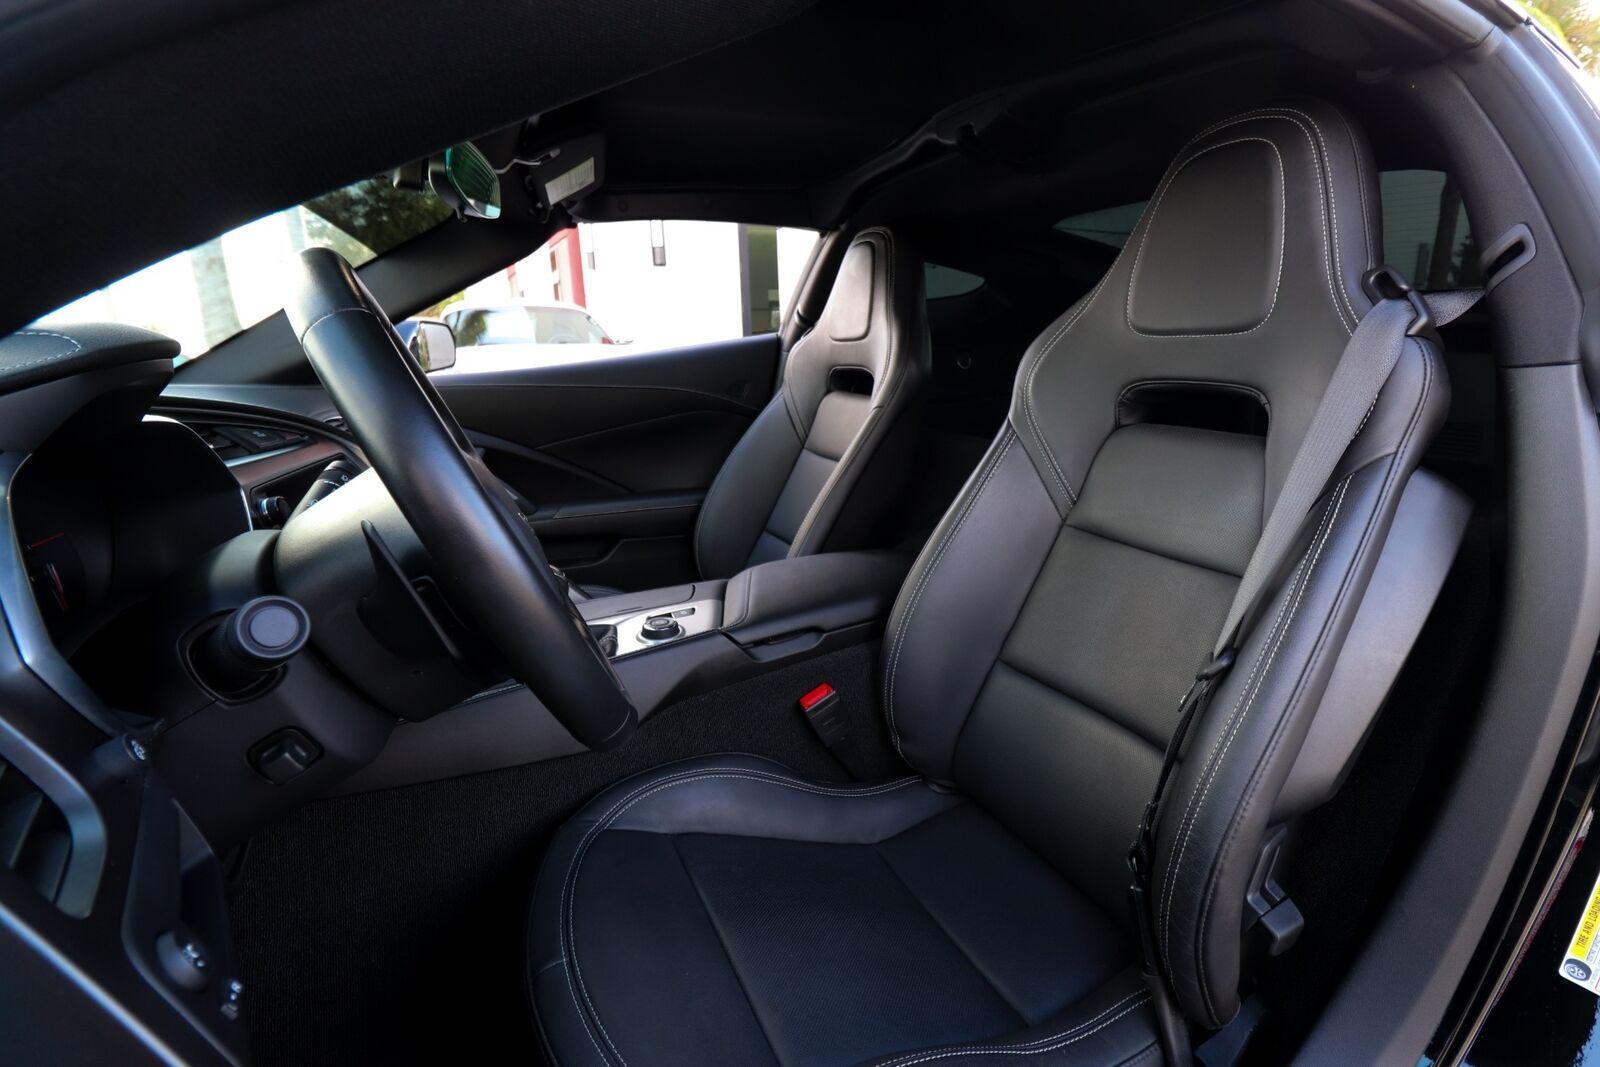 2018 Black Chevrolet Corvette Grand Sport    C7 Corvette Photo 5